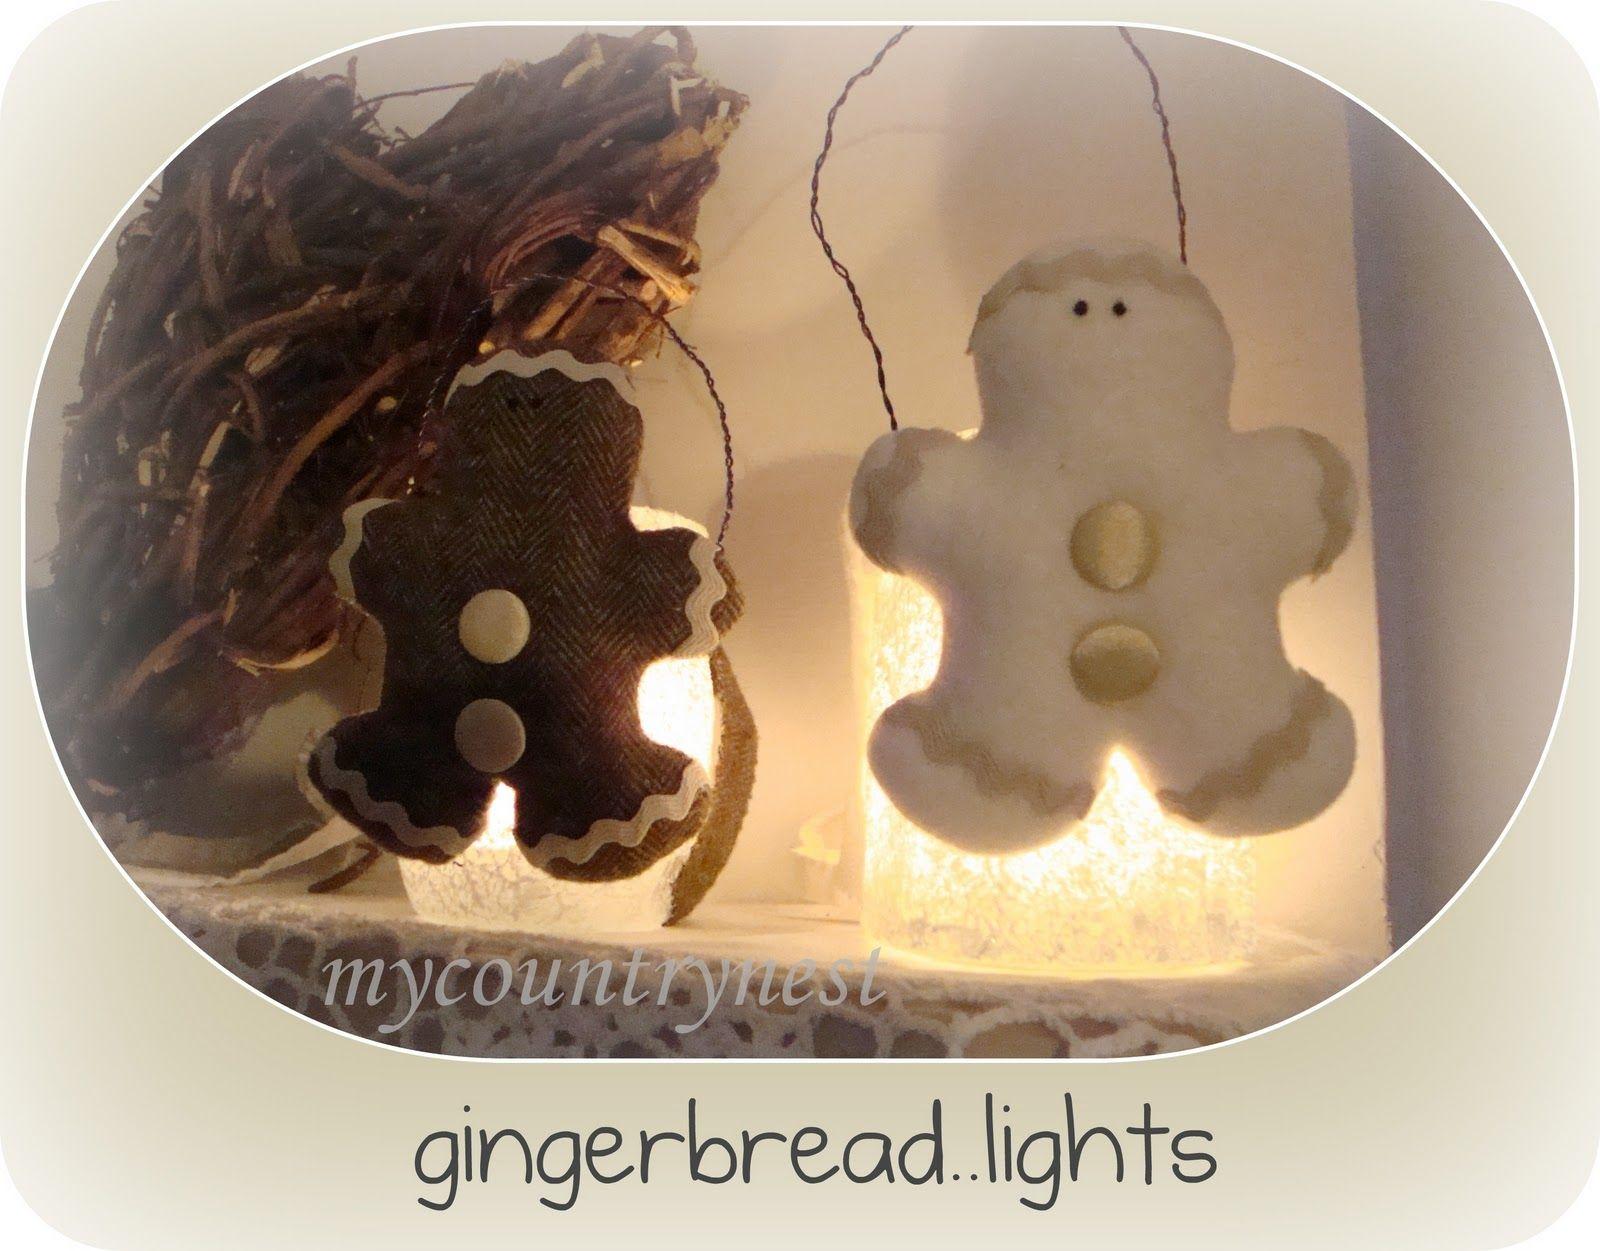 Gingerbread lights